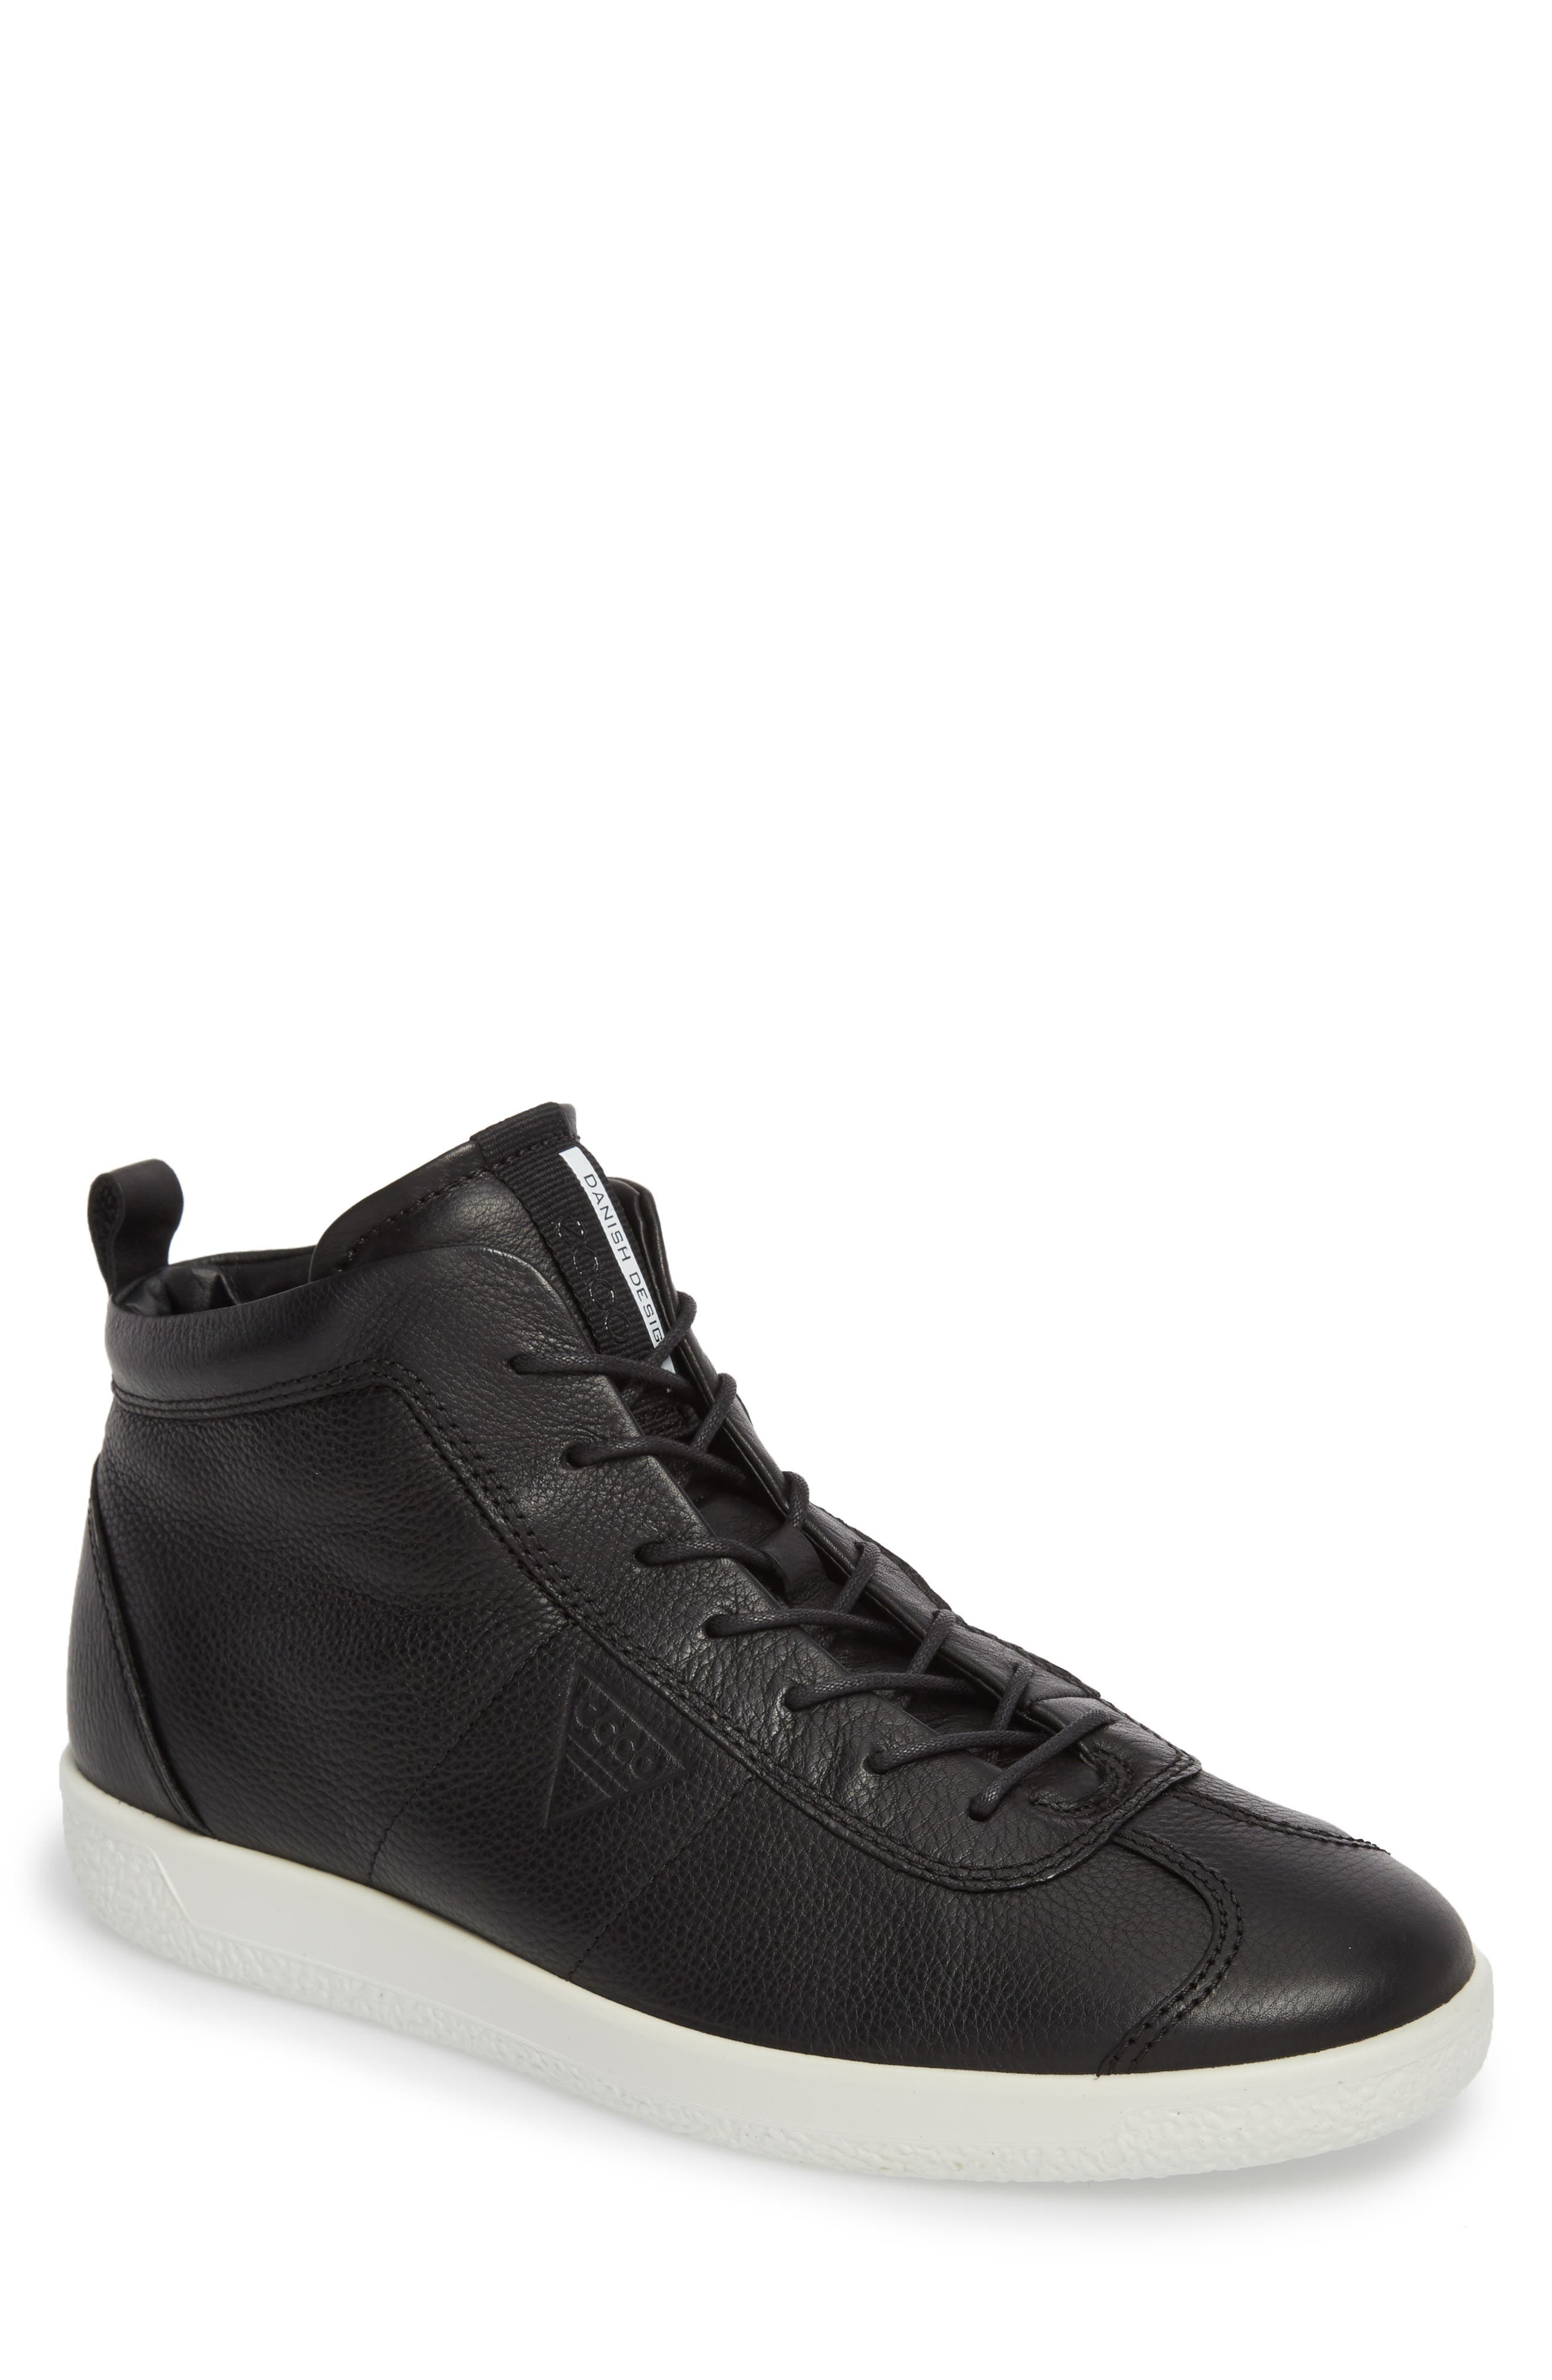 ECCO Soft 1 High Top Sneaker (Men